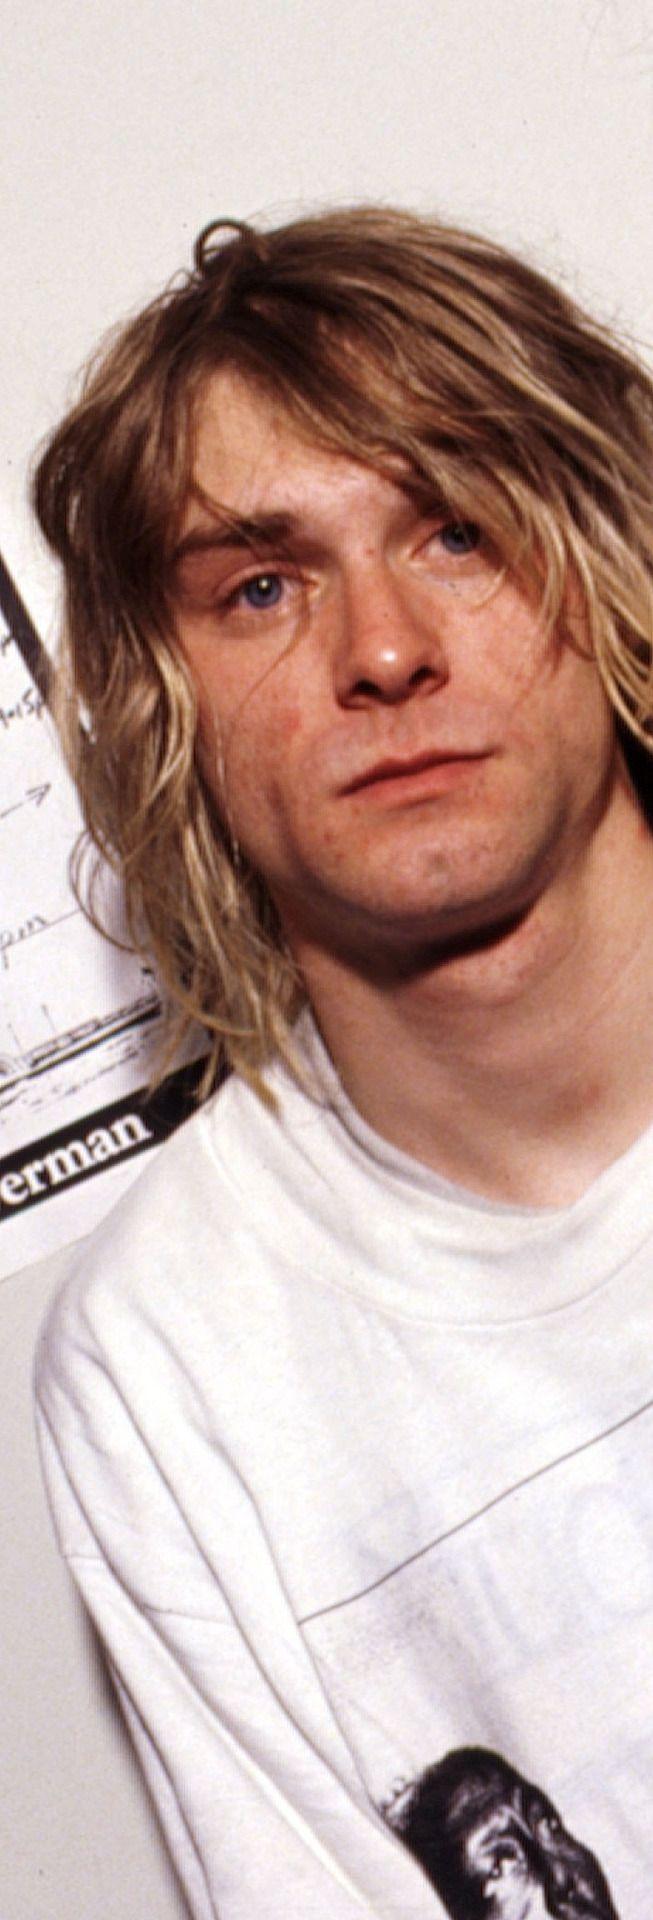 Kurt Cobain, The Astoria backstage, London, UK. 1991